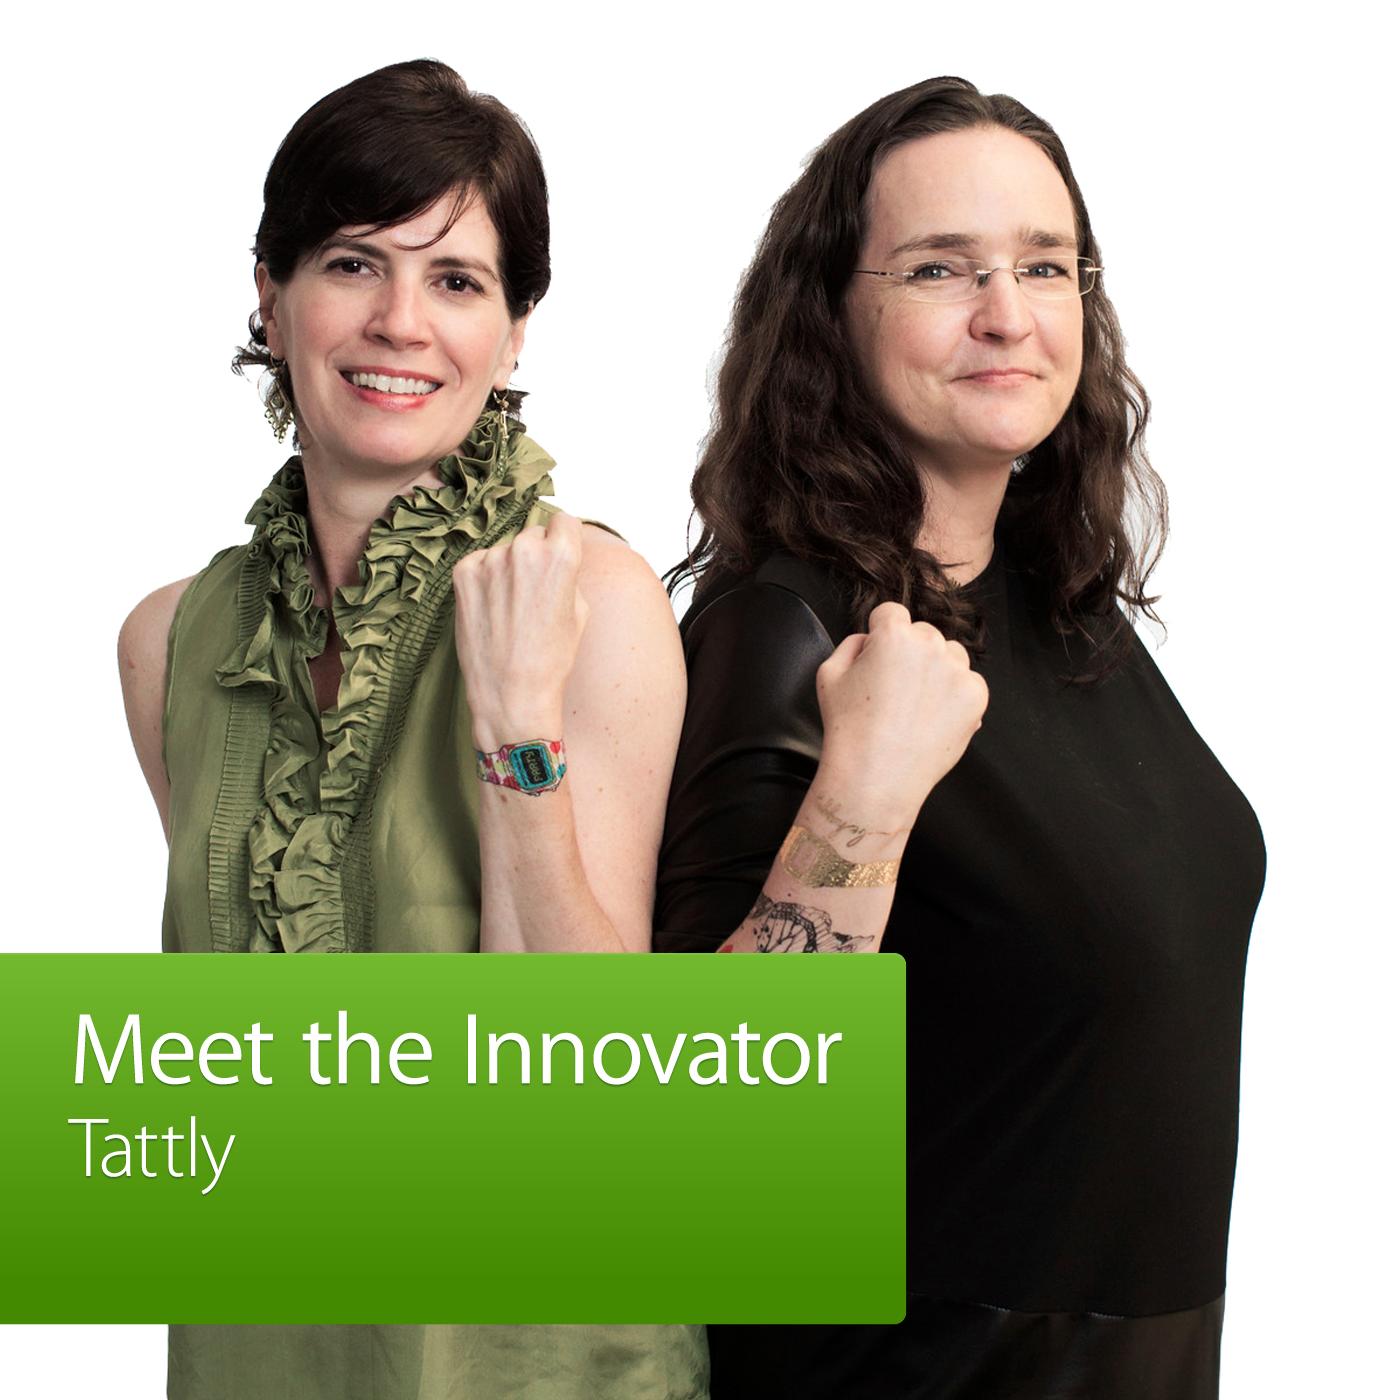 Tattly: Meet the Innovator